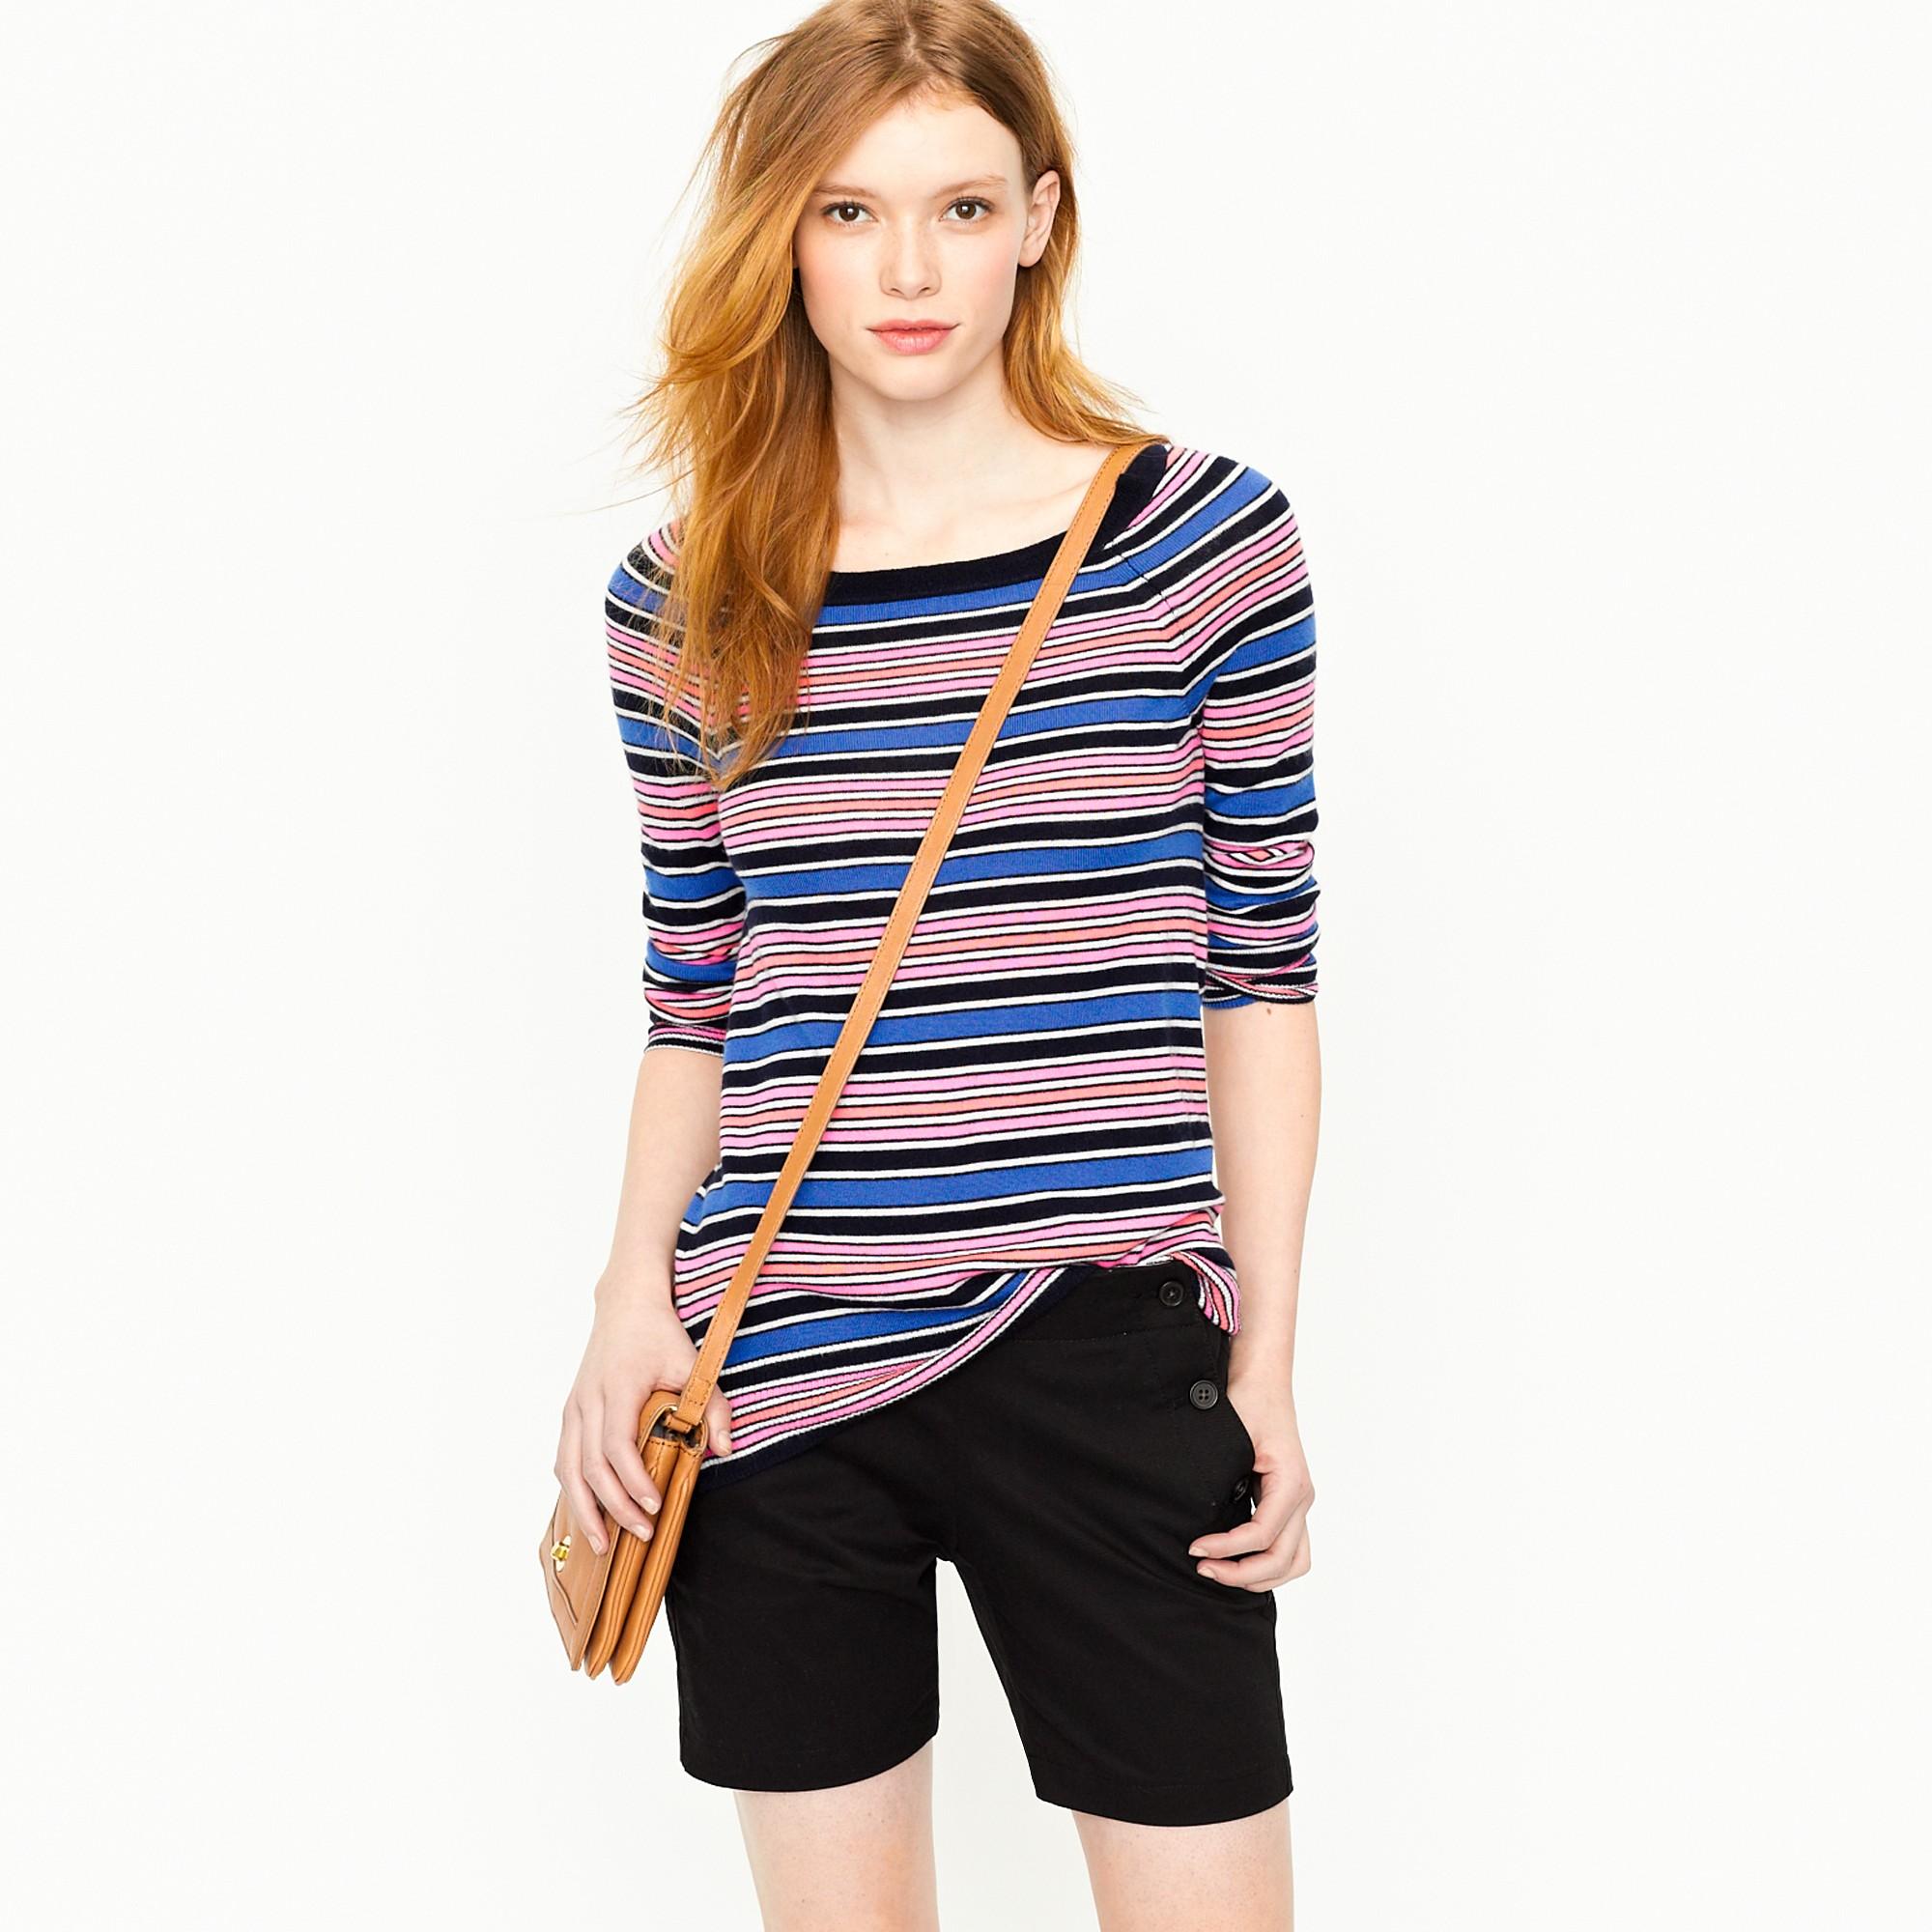 J.crew Cashmere Boatneck Sweater in Neon Multistripe in Blue | Lyst